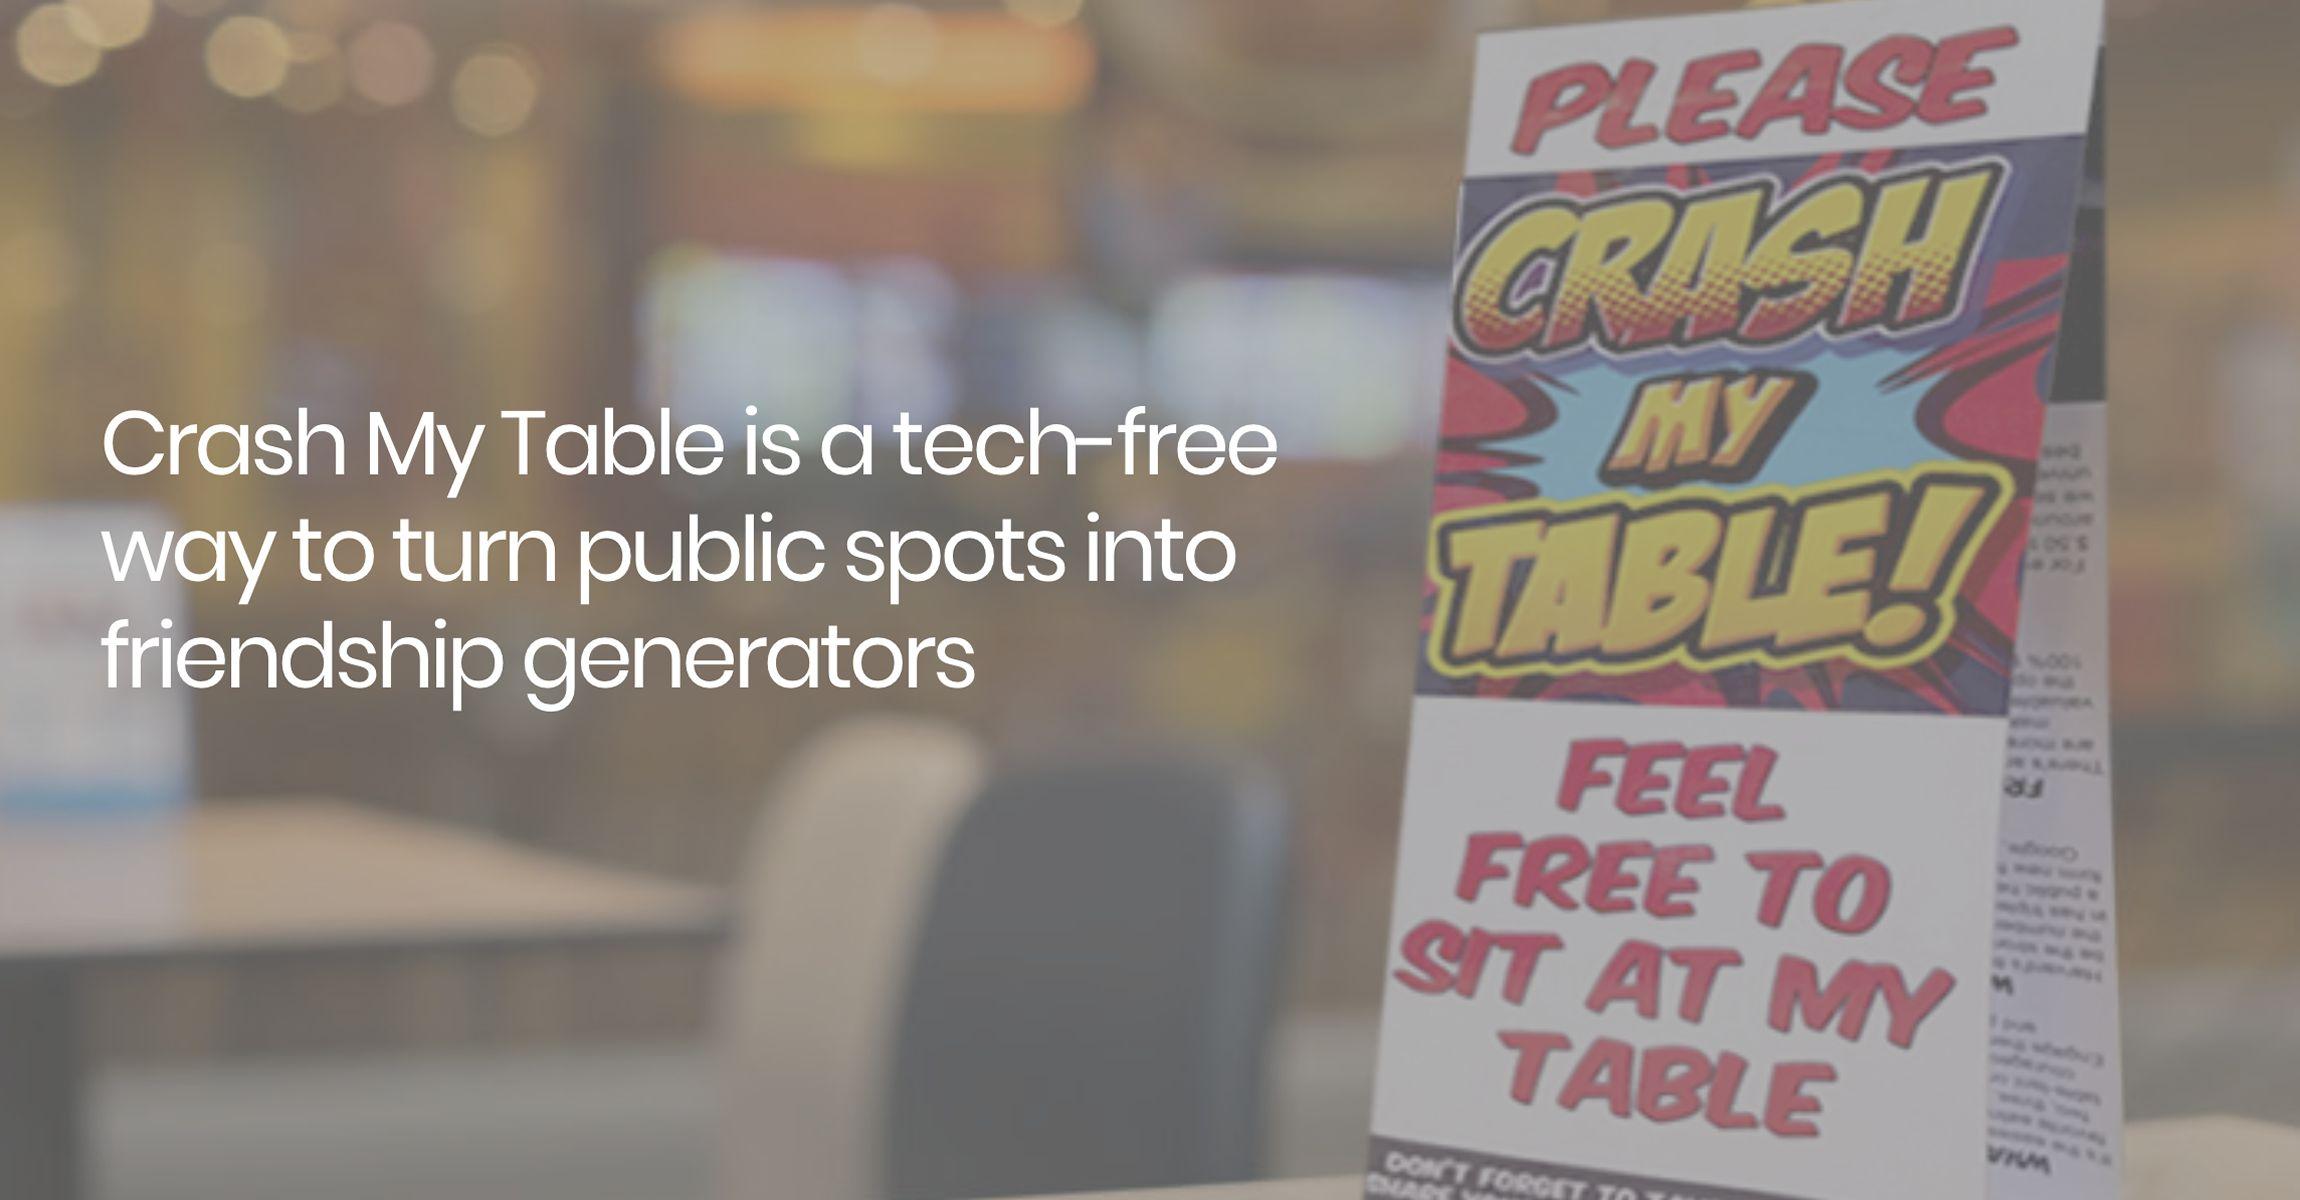 Will a Mother's New Non-Tech Kickstarter Invention Help Flood Restaurants with Patrons?